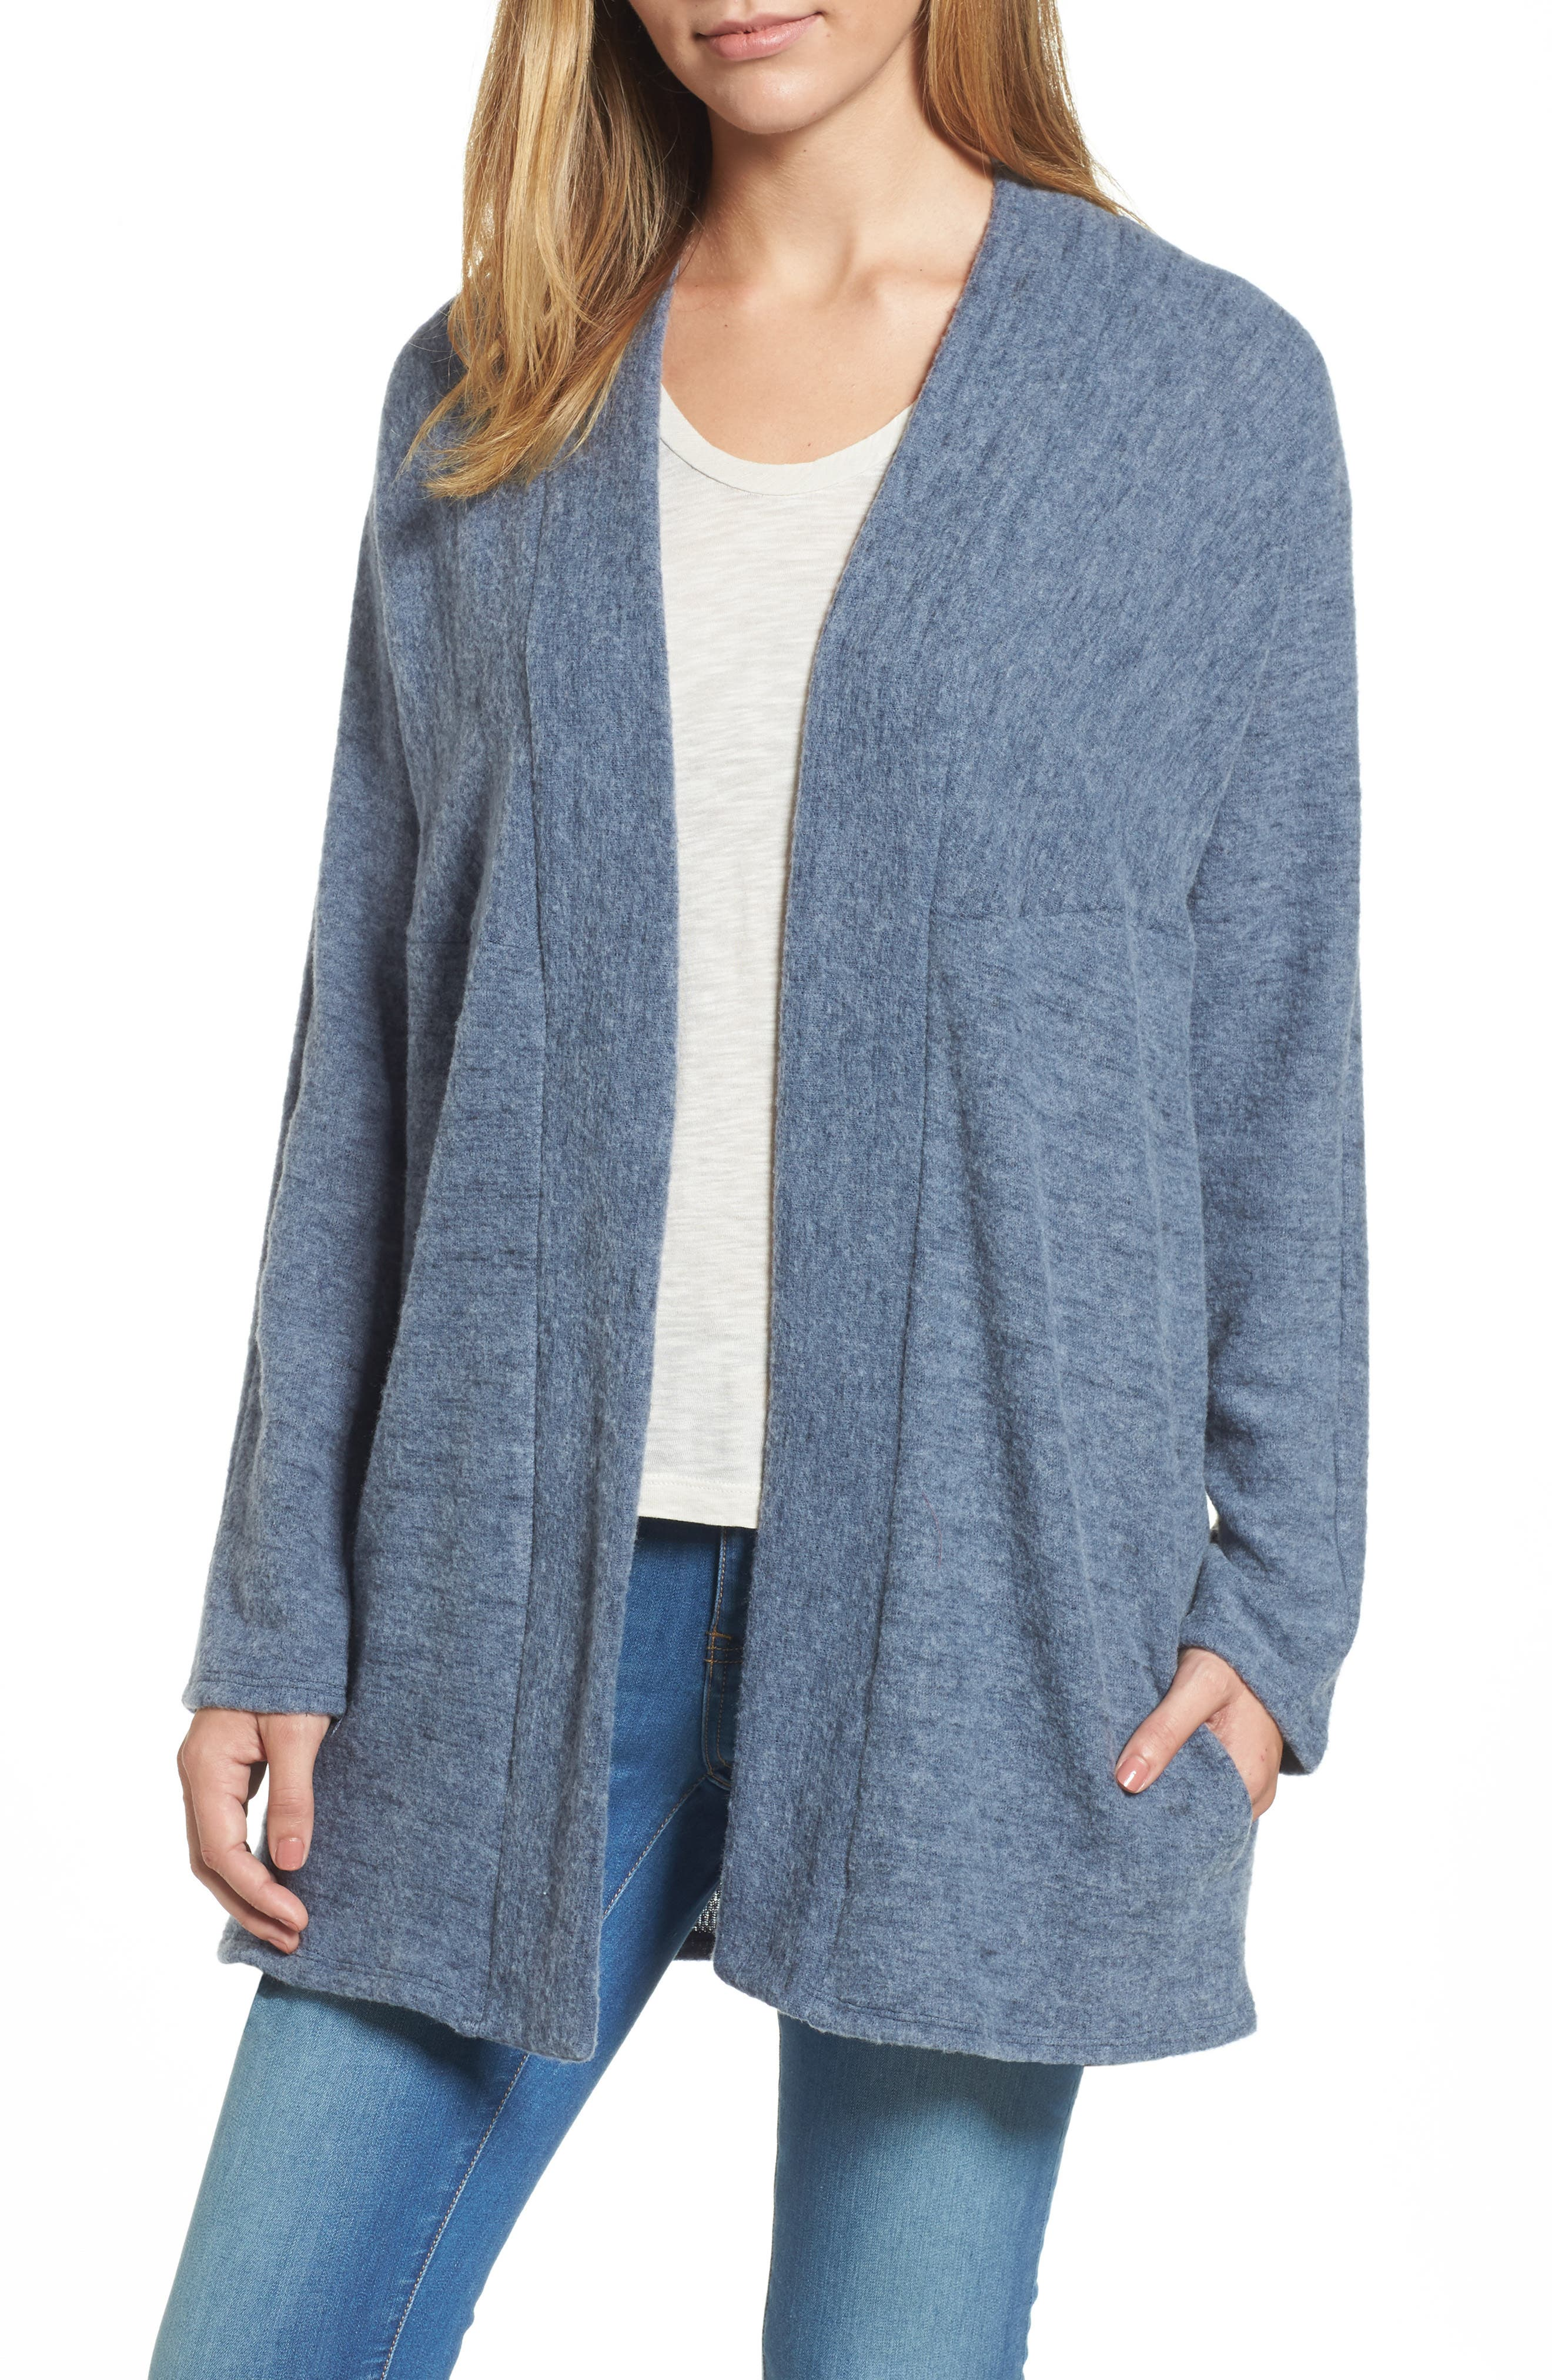 Main Image - Caslon Open Knit Cardigan